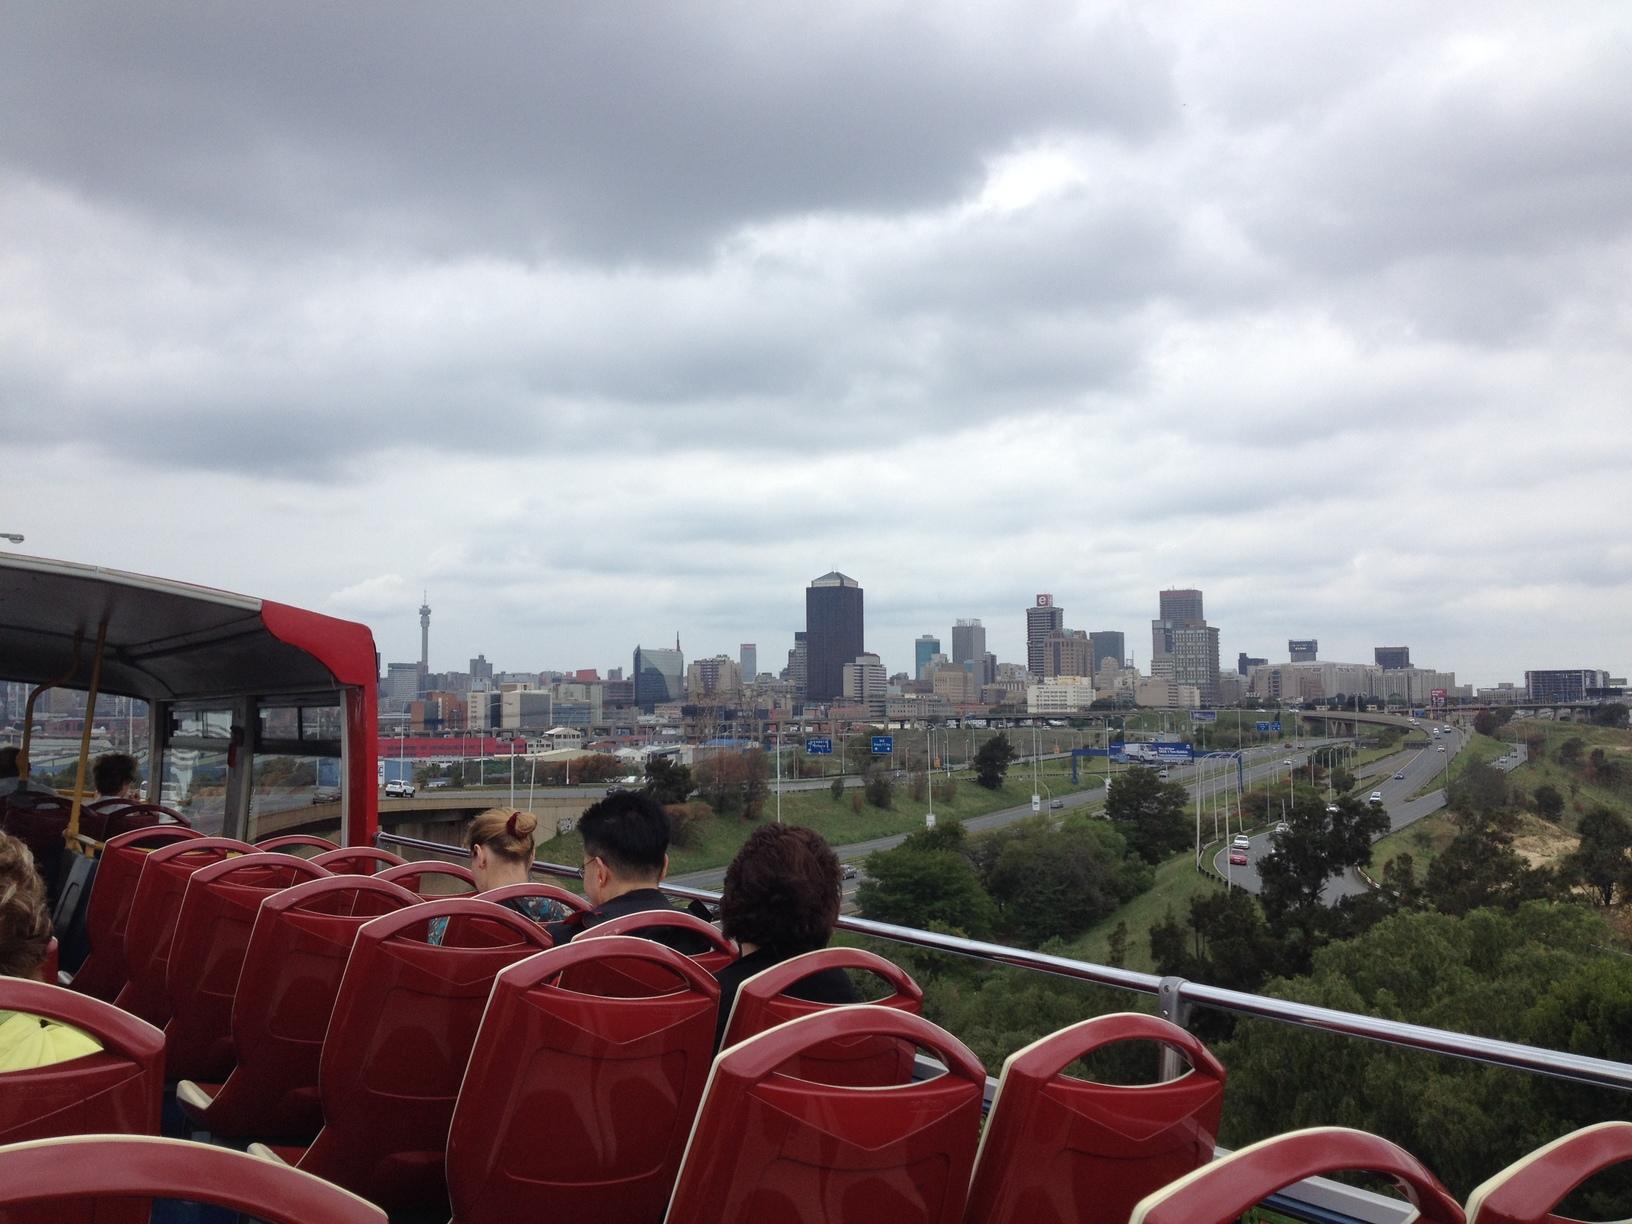 bezpecnost v juhoafrickej republike